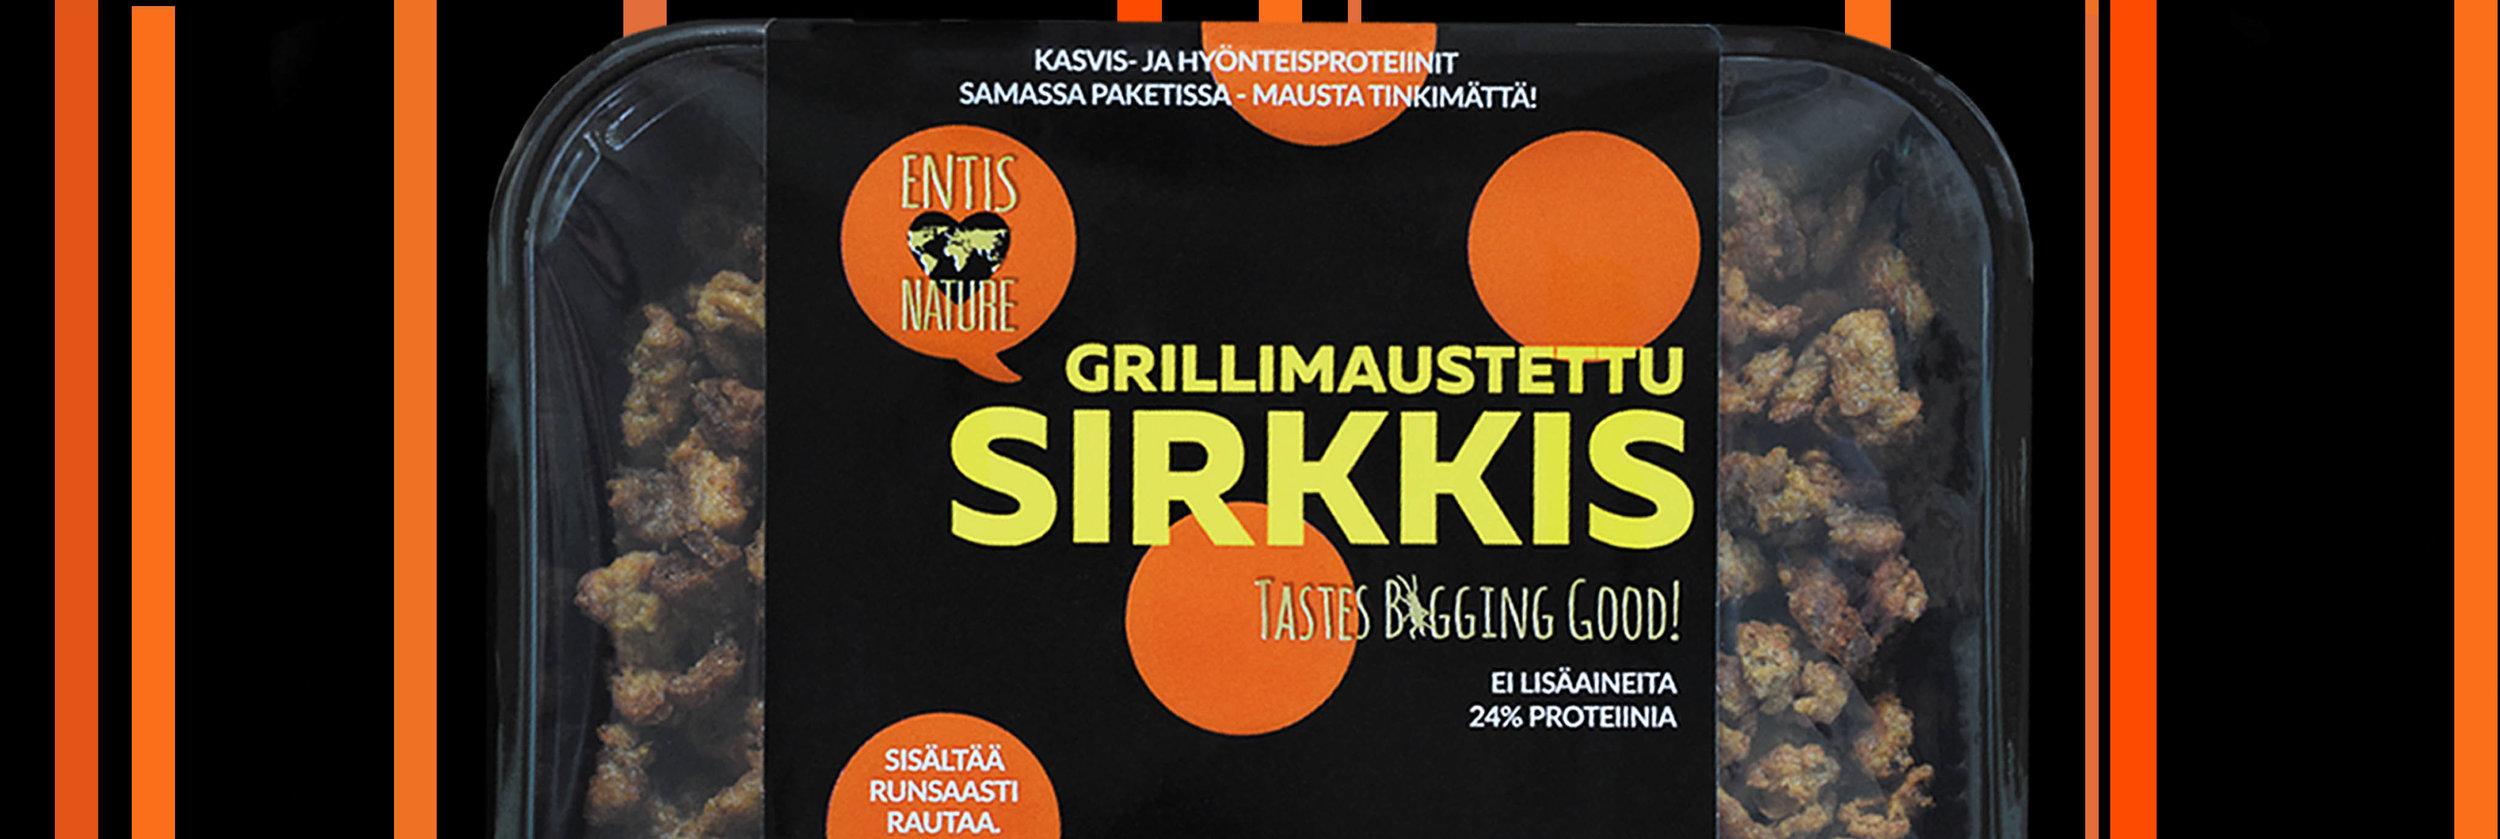 Sirkkis_stripes.jpg